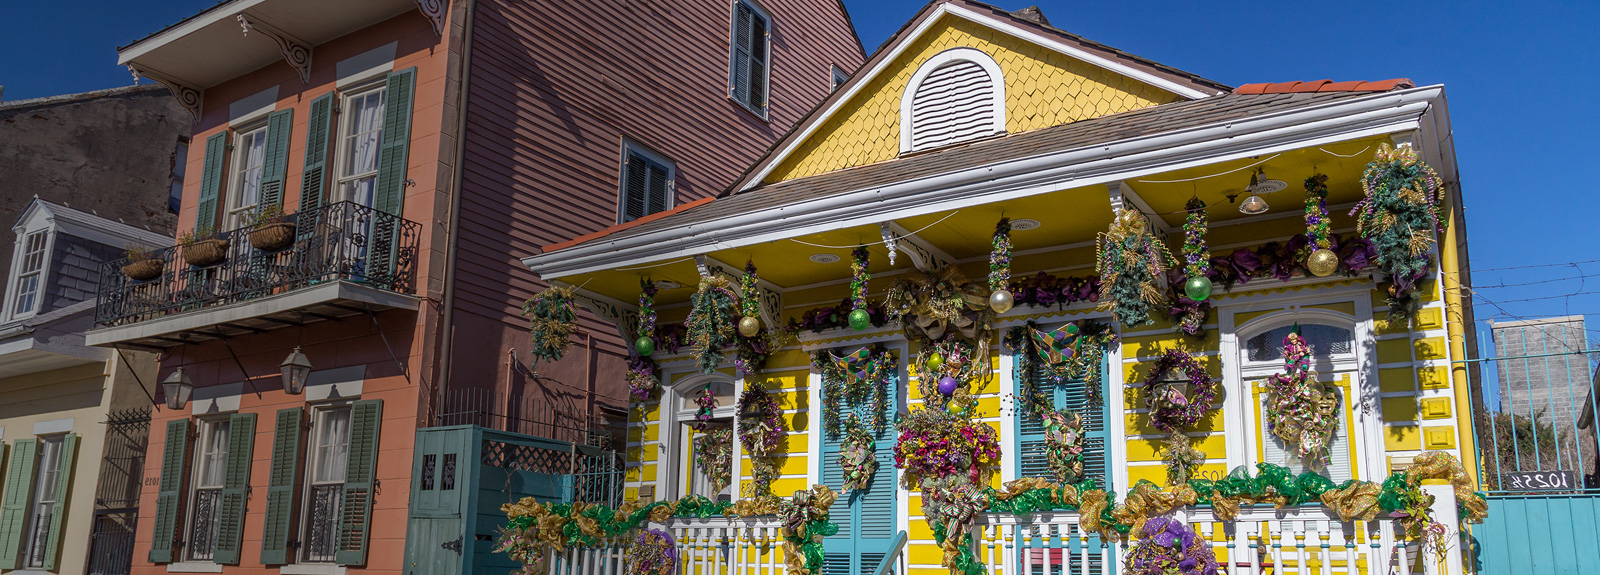 Louisiana New Orleans home warranty companies reviews